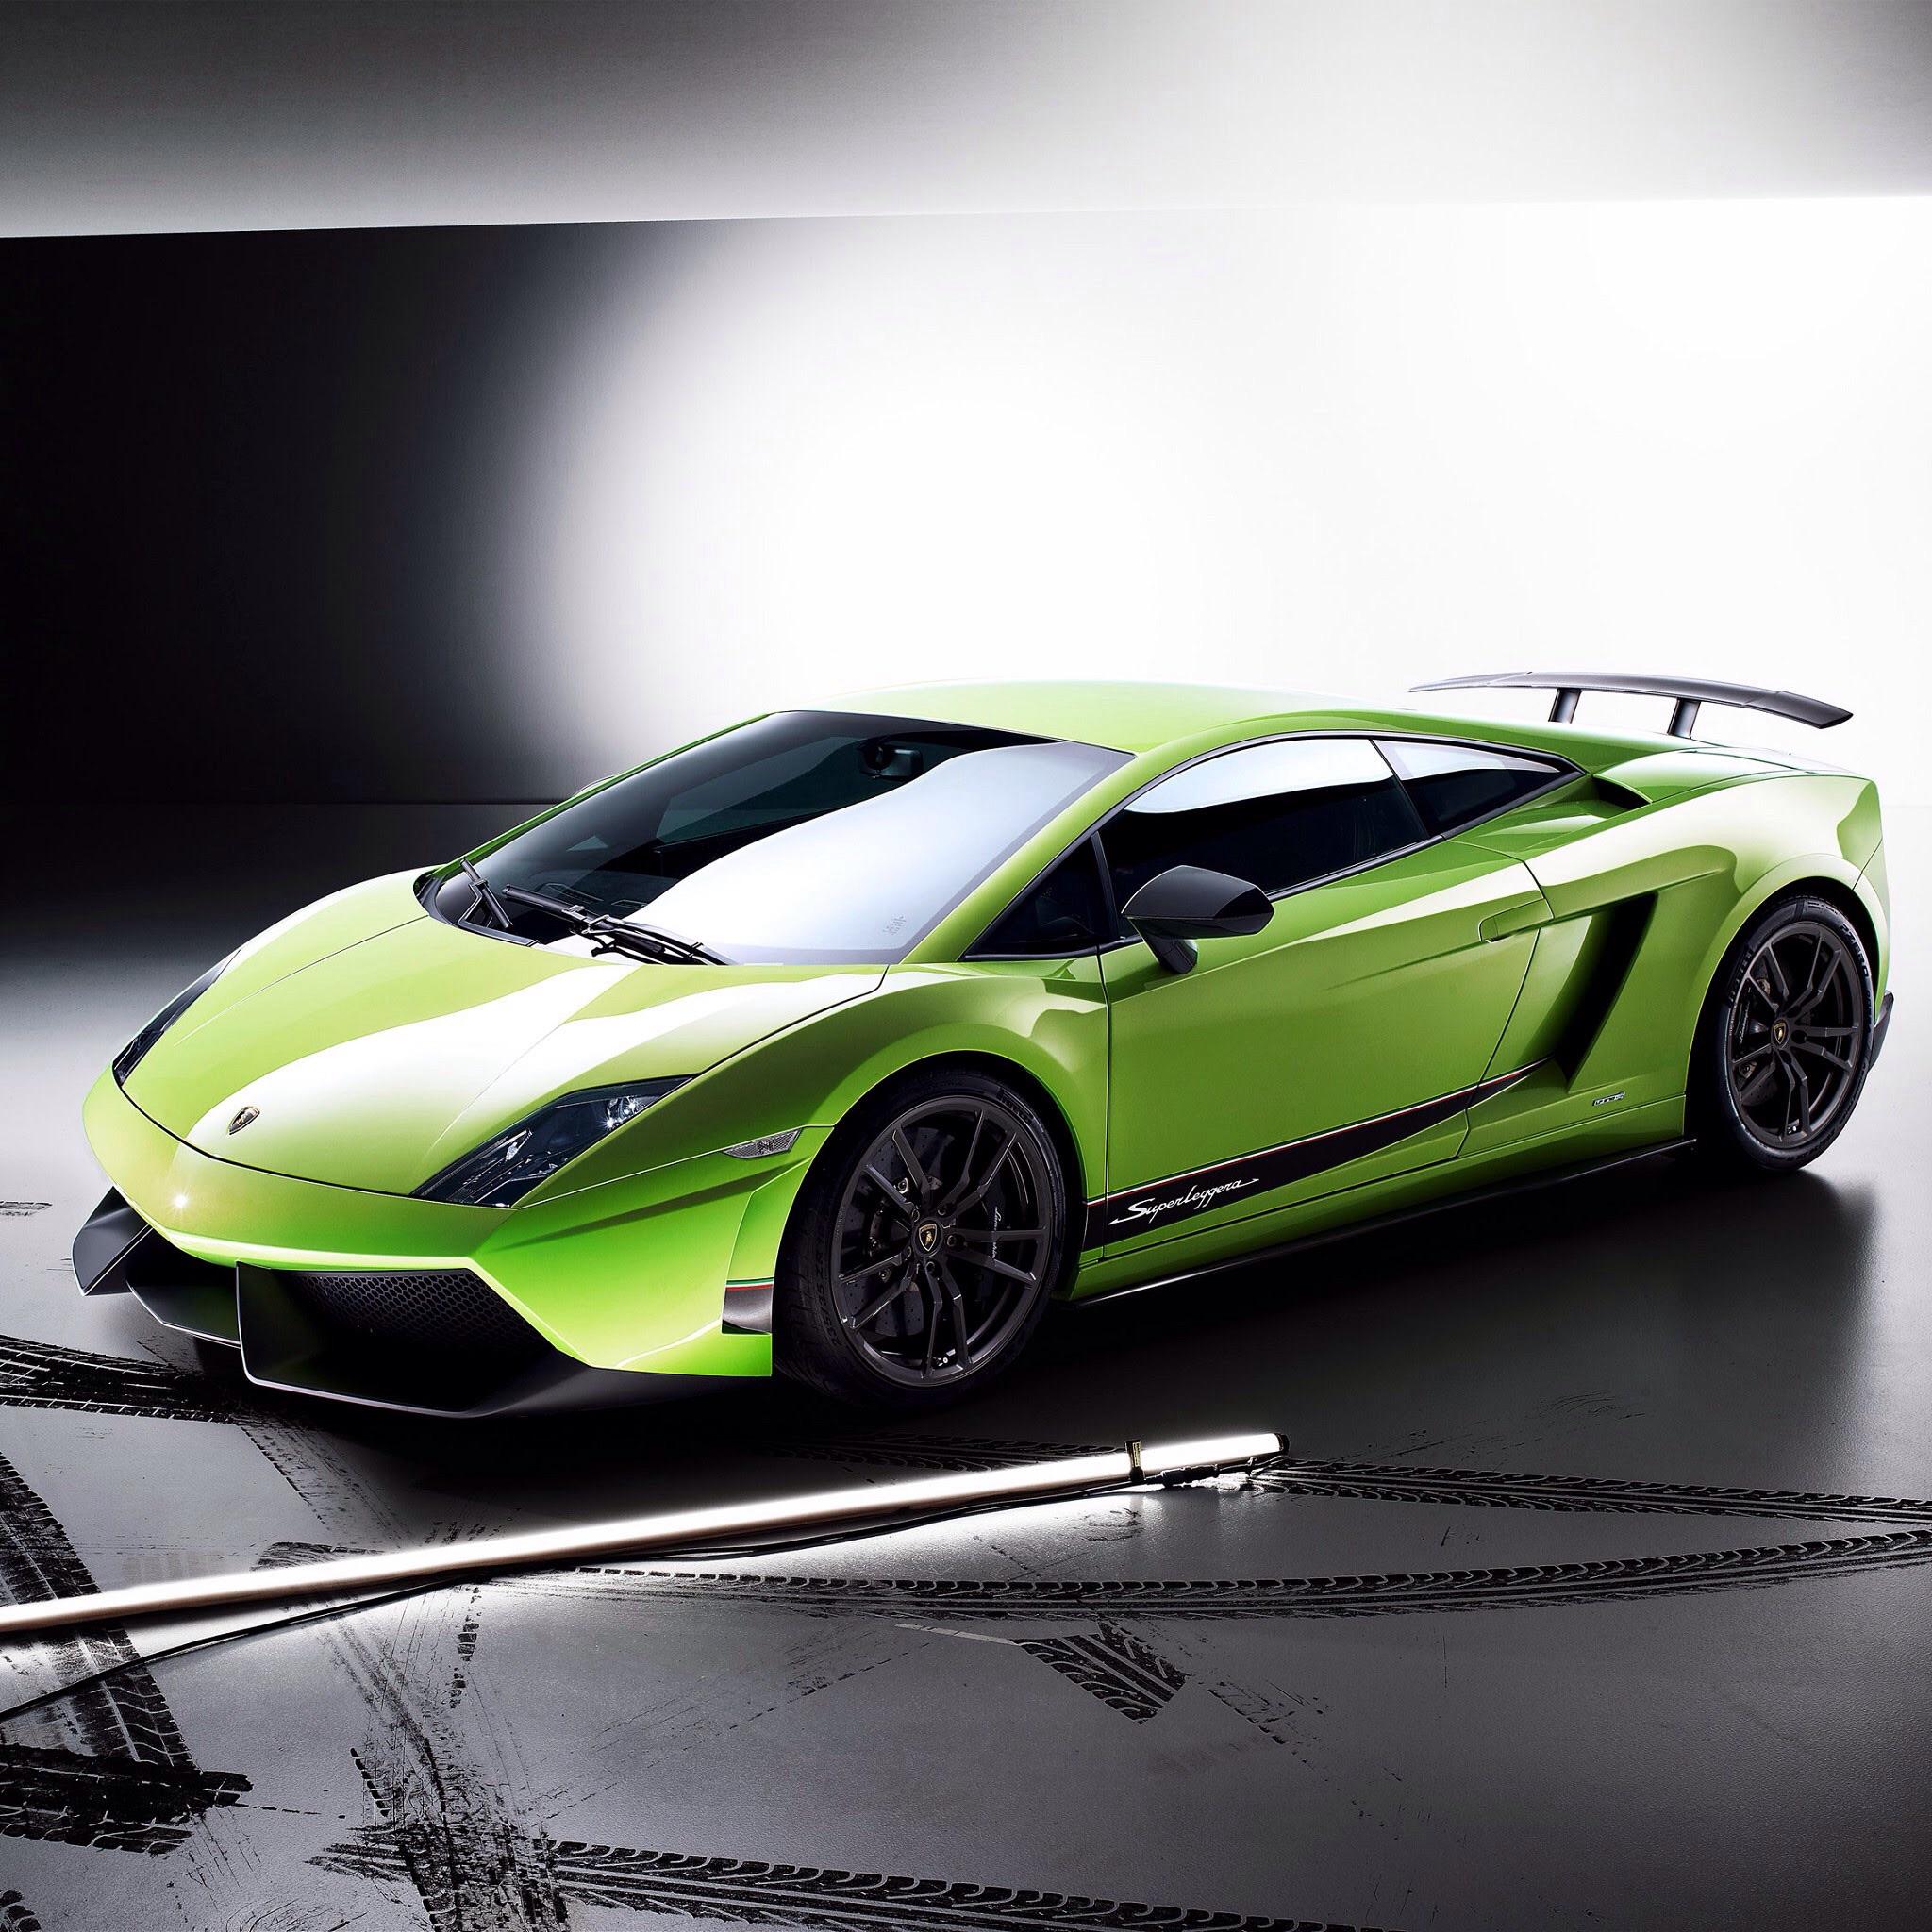 Cool-Lamborghini-wallpaper-wp3004560